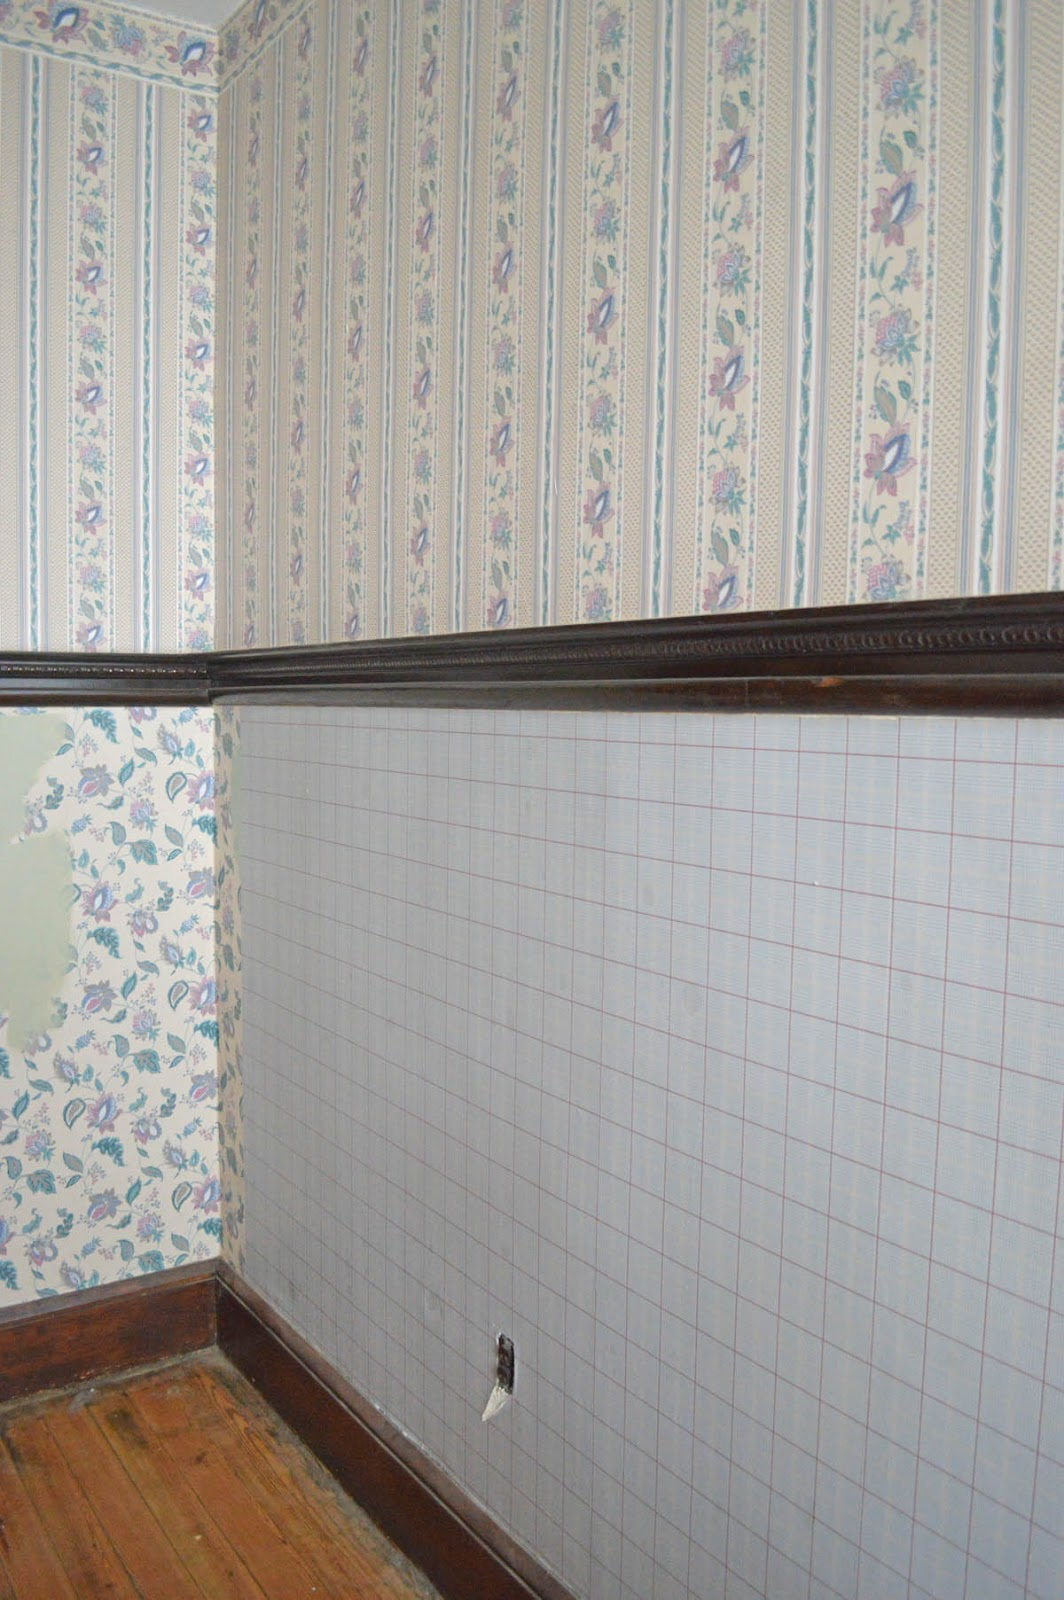 co Wallpaper on Old Plaster Walls Wallpaper Steamer Peeling Paint 1064x1600